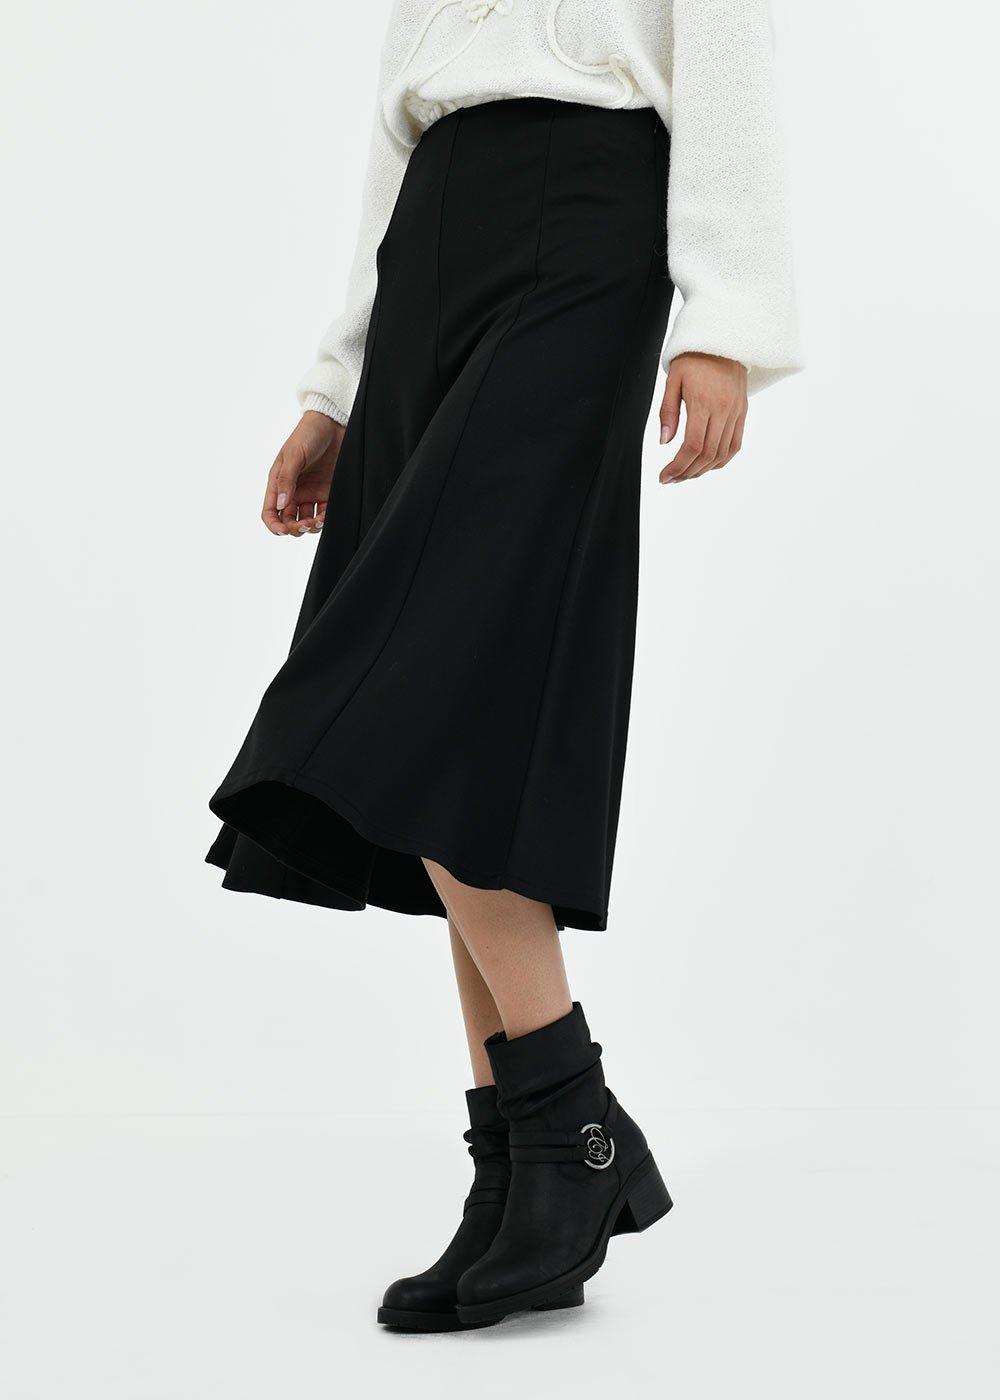 Glen skirt in Milano stitch - Black - Woman